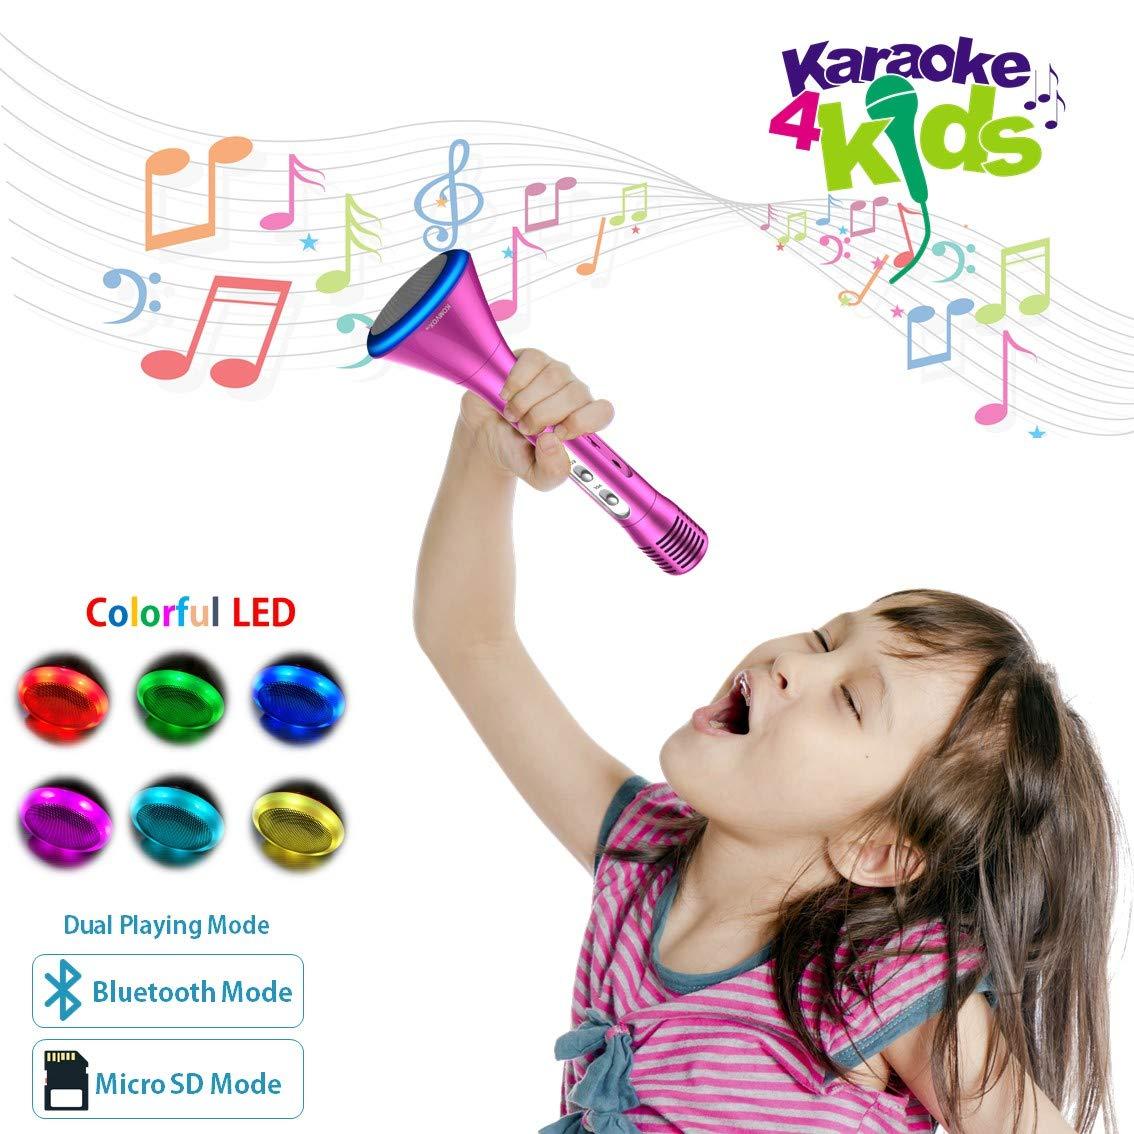 KOMVOX Wireless Karaoke Microphone For KidsBirthday Gifts for Girls Toddlers Bluetooth Karaoke Machine  sc 1 st  Amazon.com & Gifts for Teenagers: Amazon.com